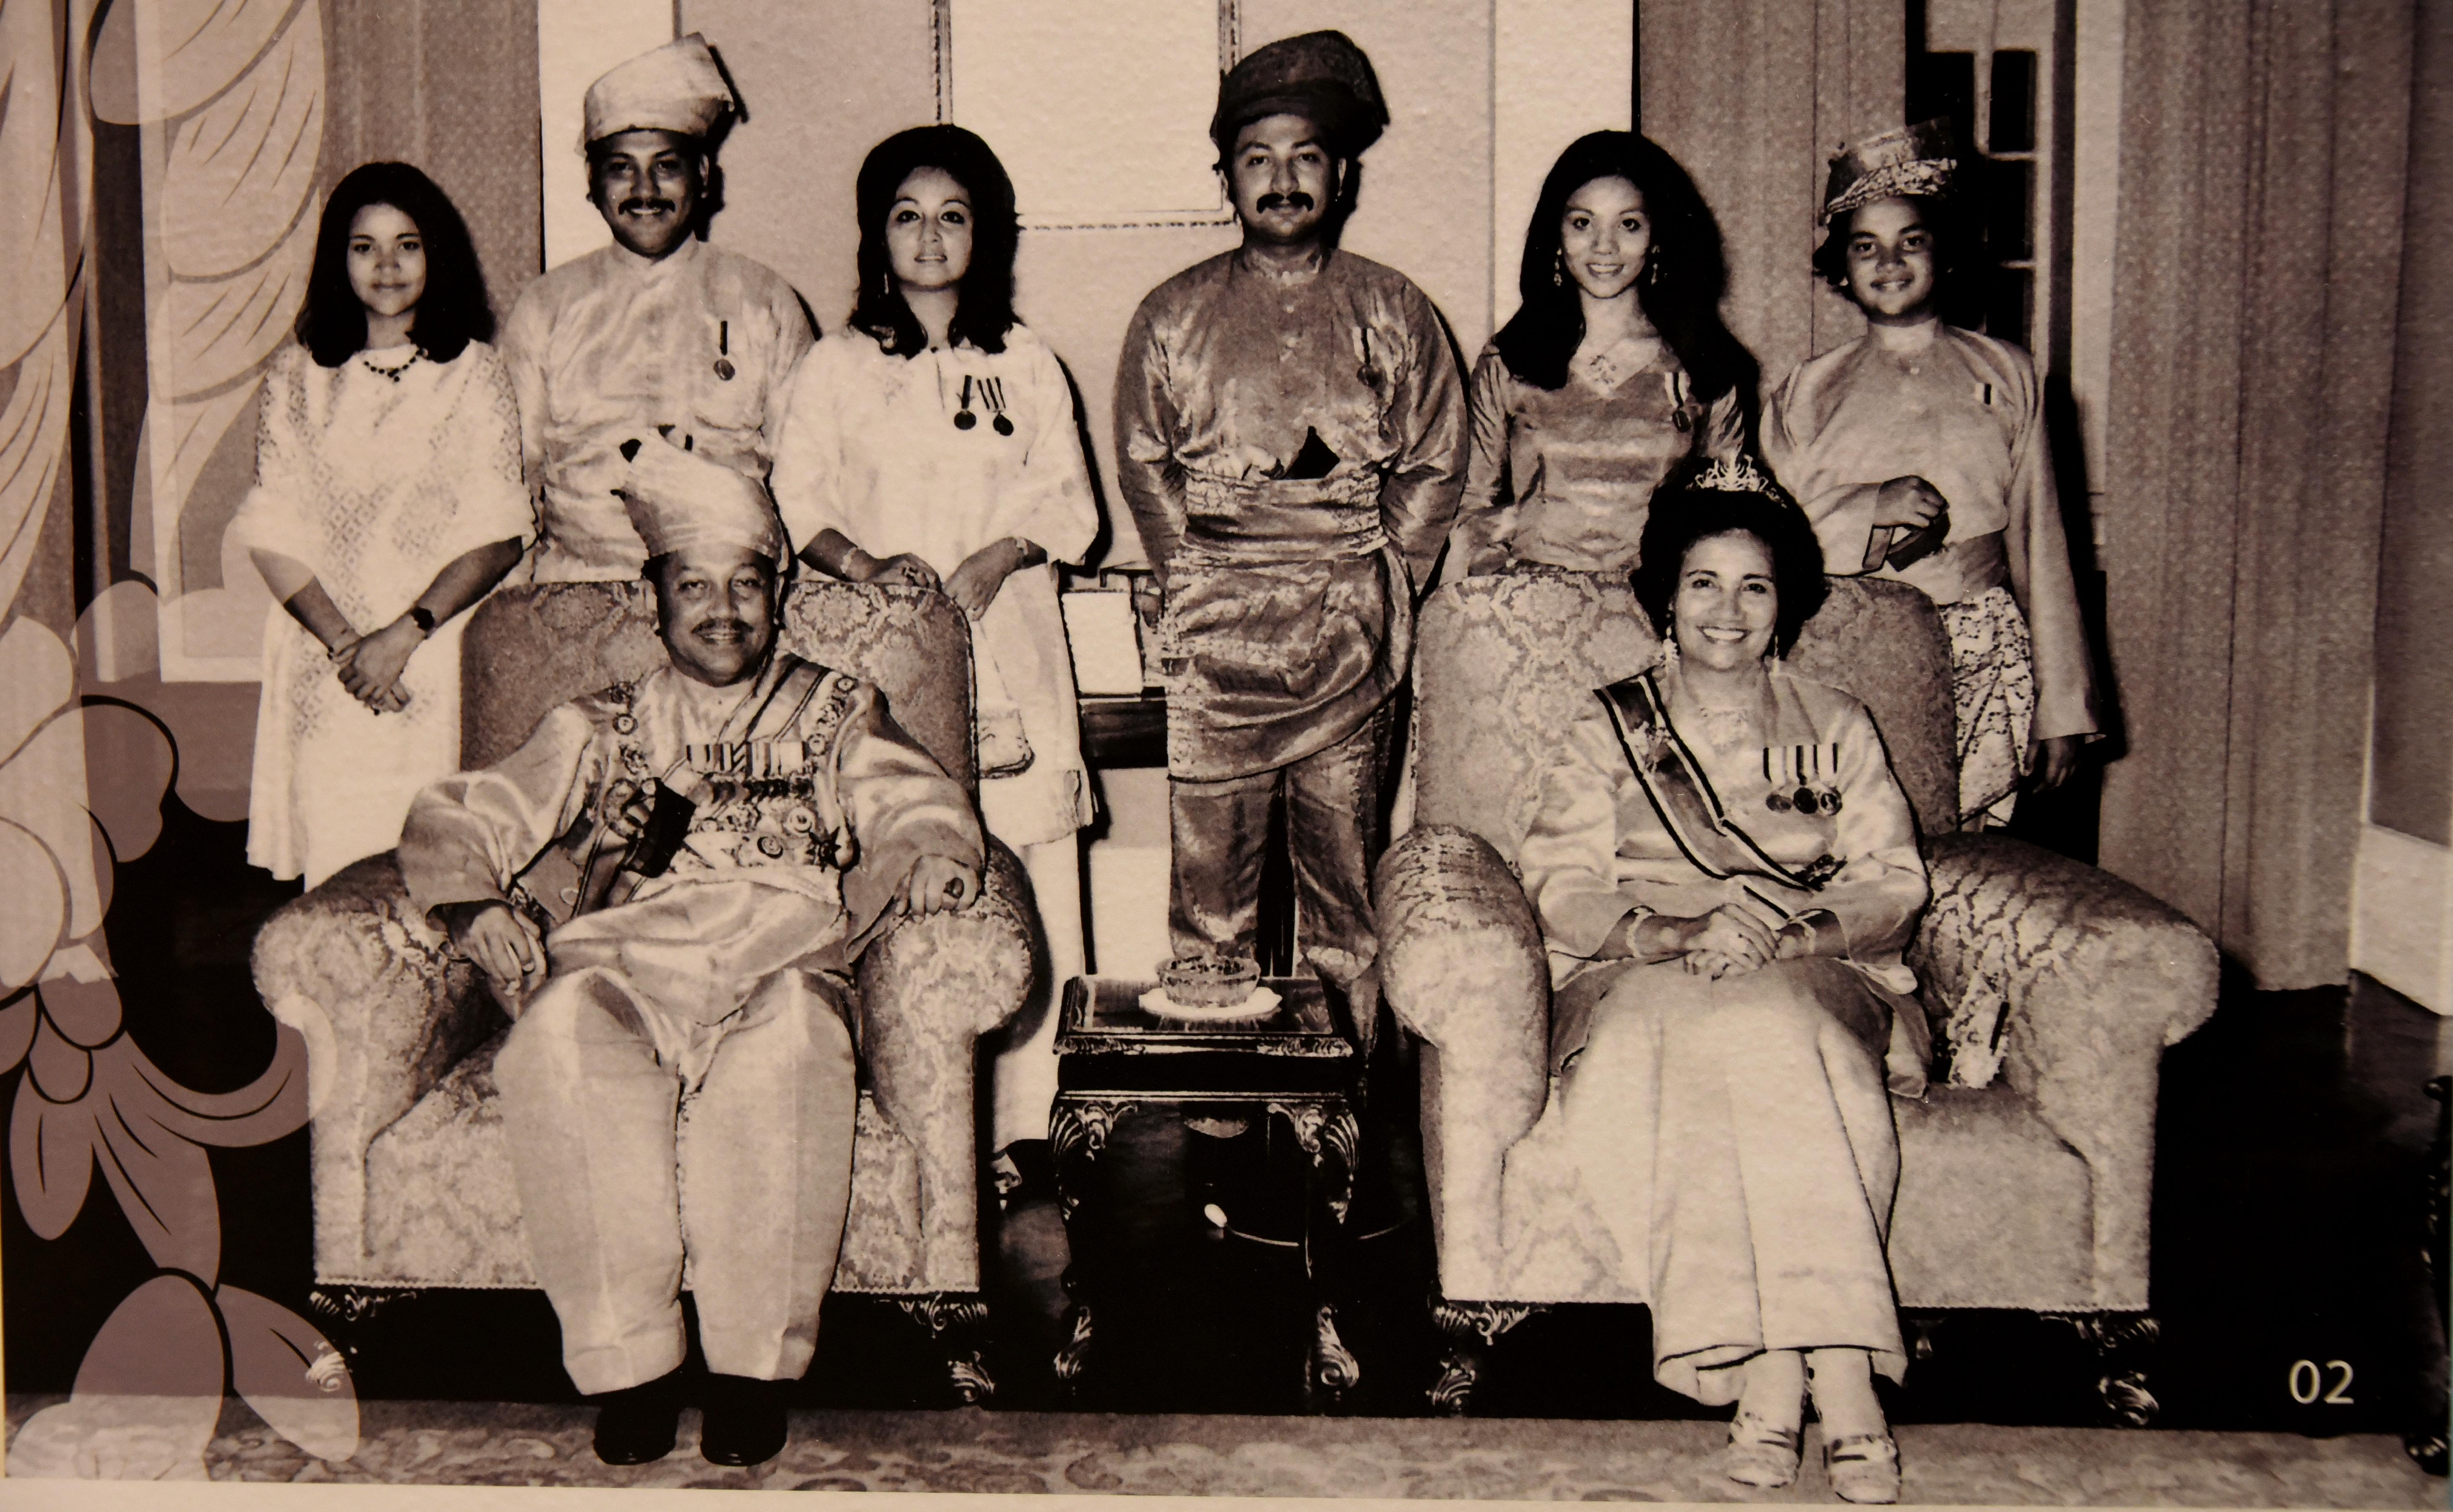 File Photo Of The Royal Family After Hrh Tuanku Ja Afar Was Installed As The 10th Yang Di Pertuan Besar Of Negeri Sembilan In 1968 The Tuanku Ja Afar Royal Gallery Seremban Jpg Wikipedia